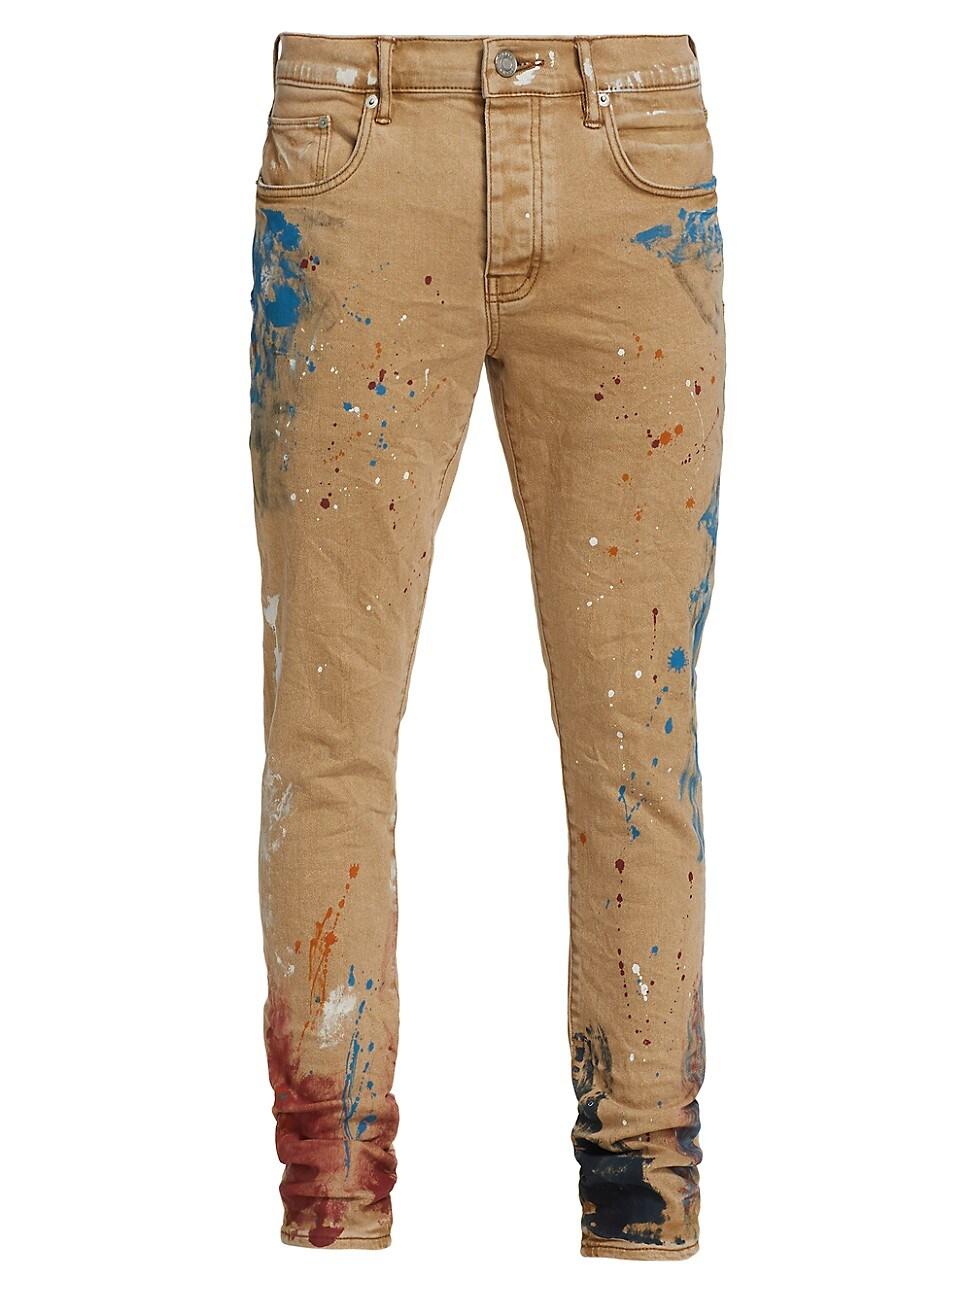 Purple Brand Jeans MEN'S P001 PAINT SPLATTER SKINNY JEANS